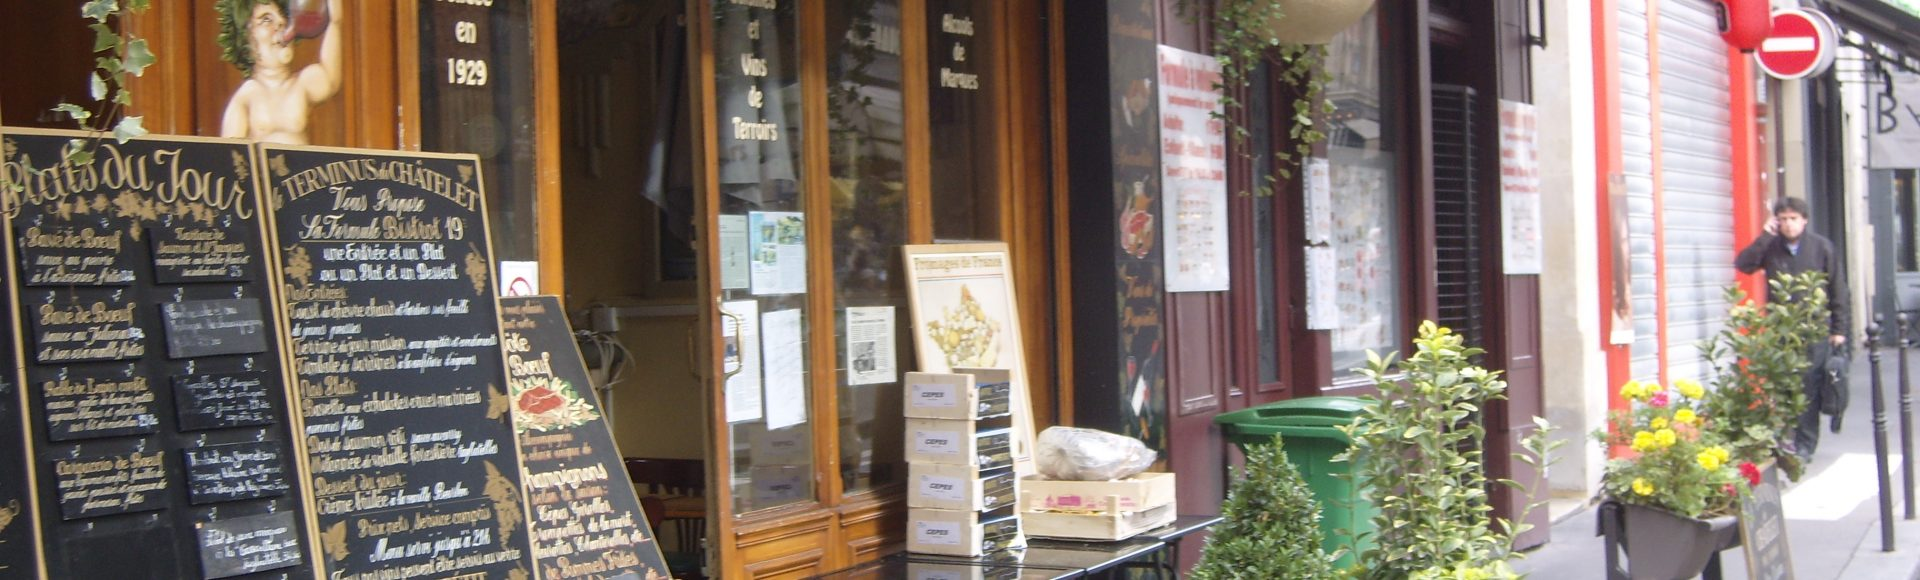 Wandering Paris: 5 Neighborhoods to Explore